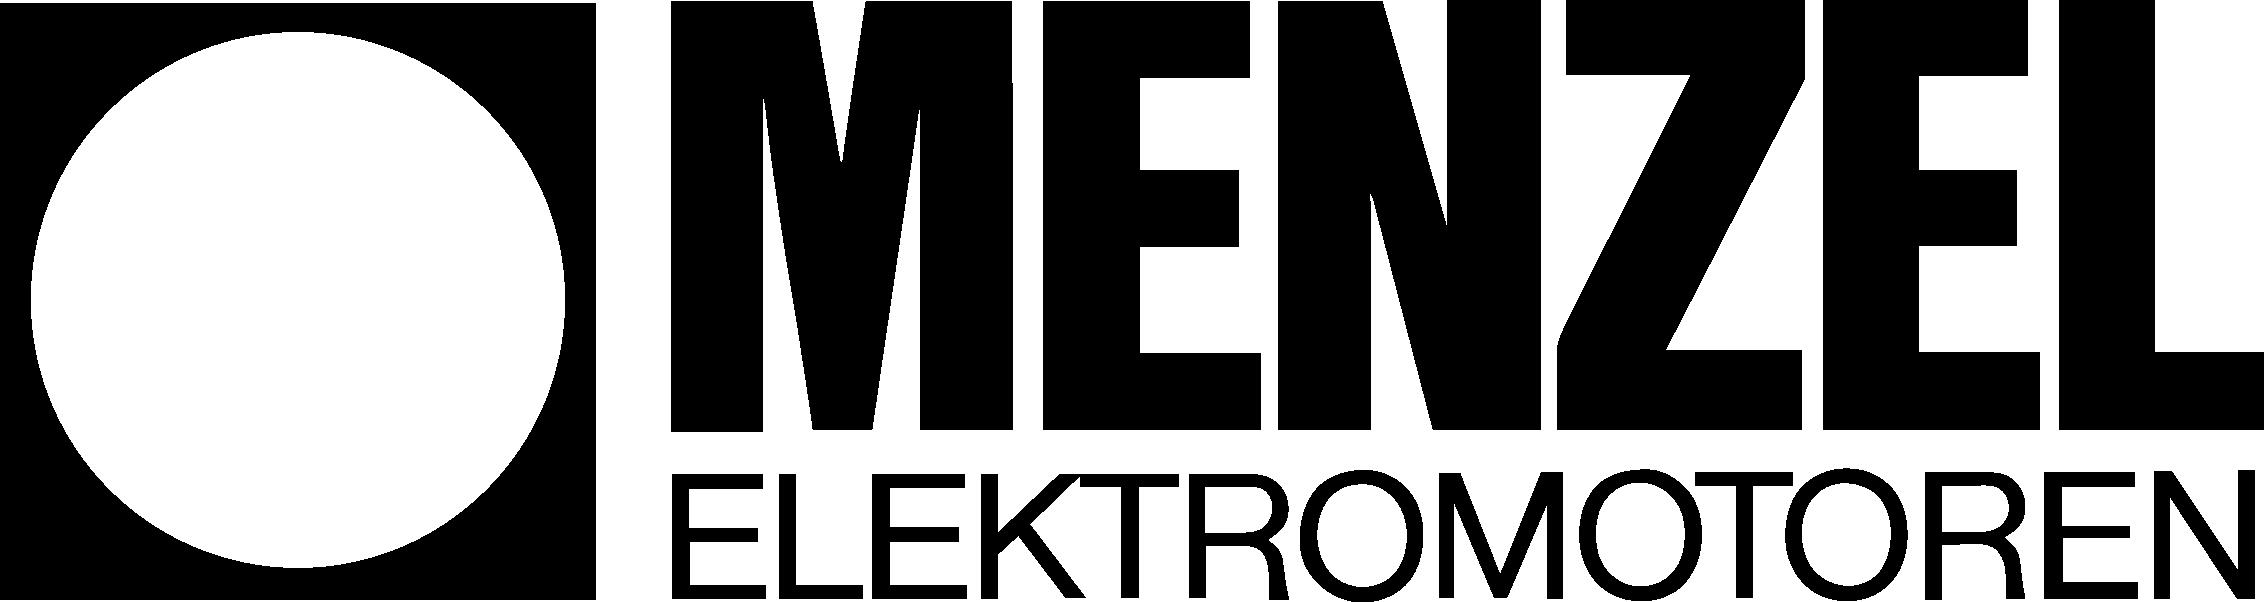 Menzel elektromotoren Image